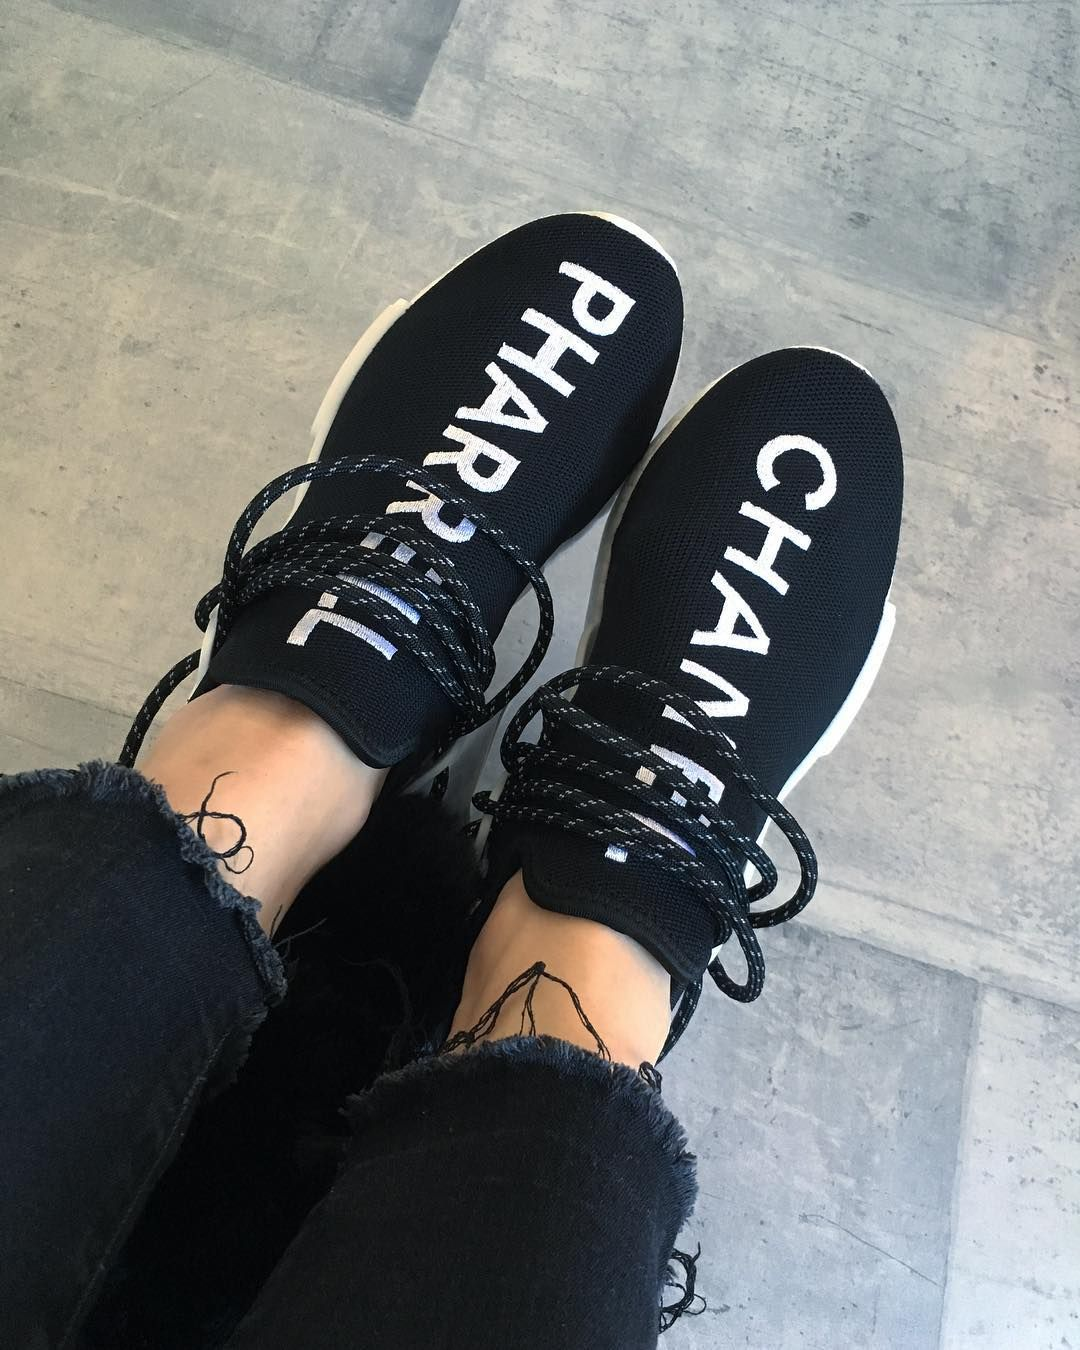 3b0da291a Chanel x Pharrell x adidas NMD Human Race Trail